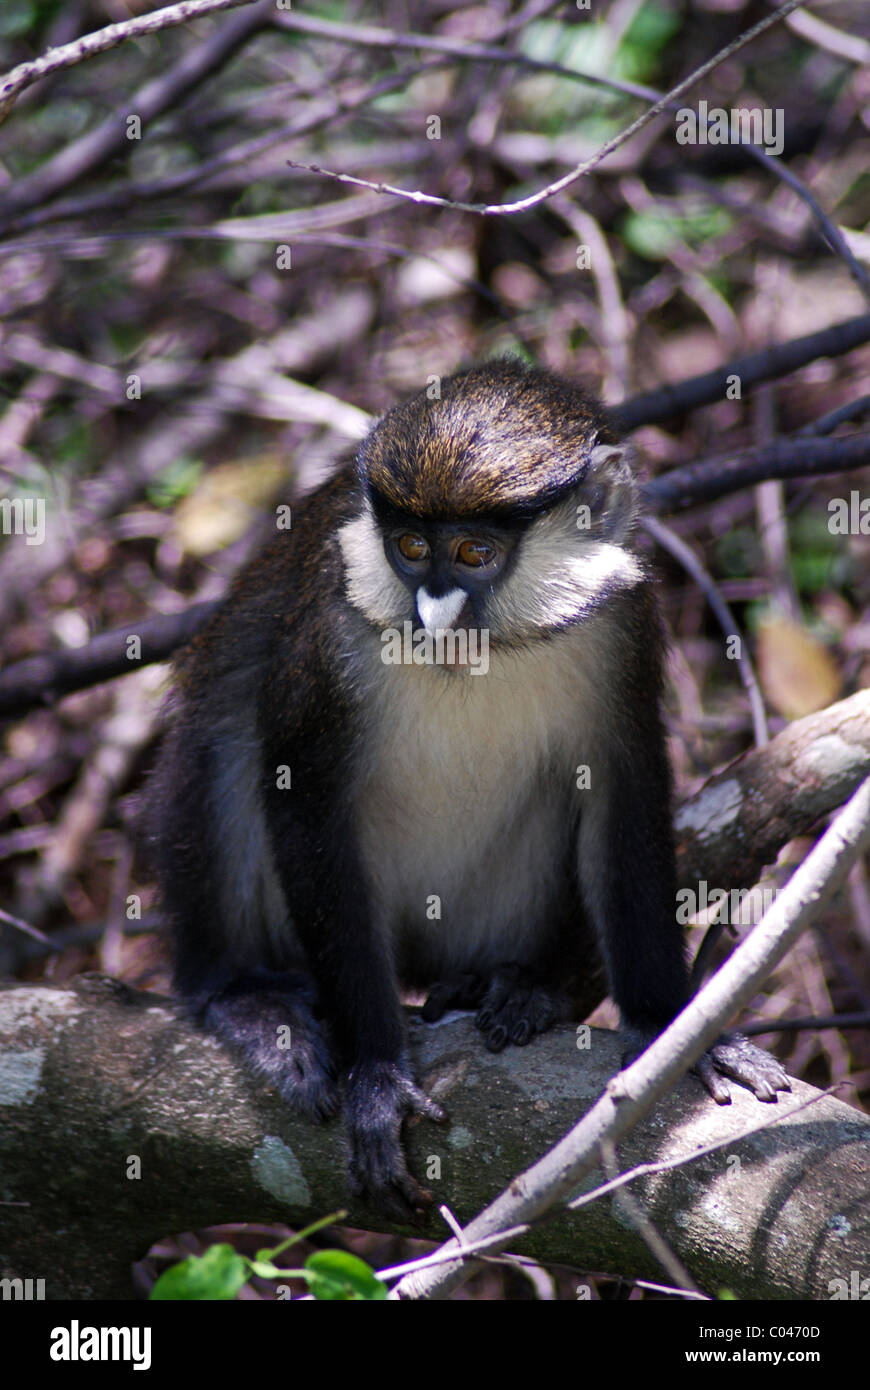 Red-tailed monkey (Cercopithecus ascanius), Kichwa Tembo Forest, Maasai Mara, Kenya - Stock Image